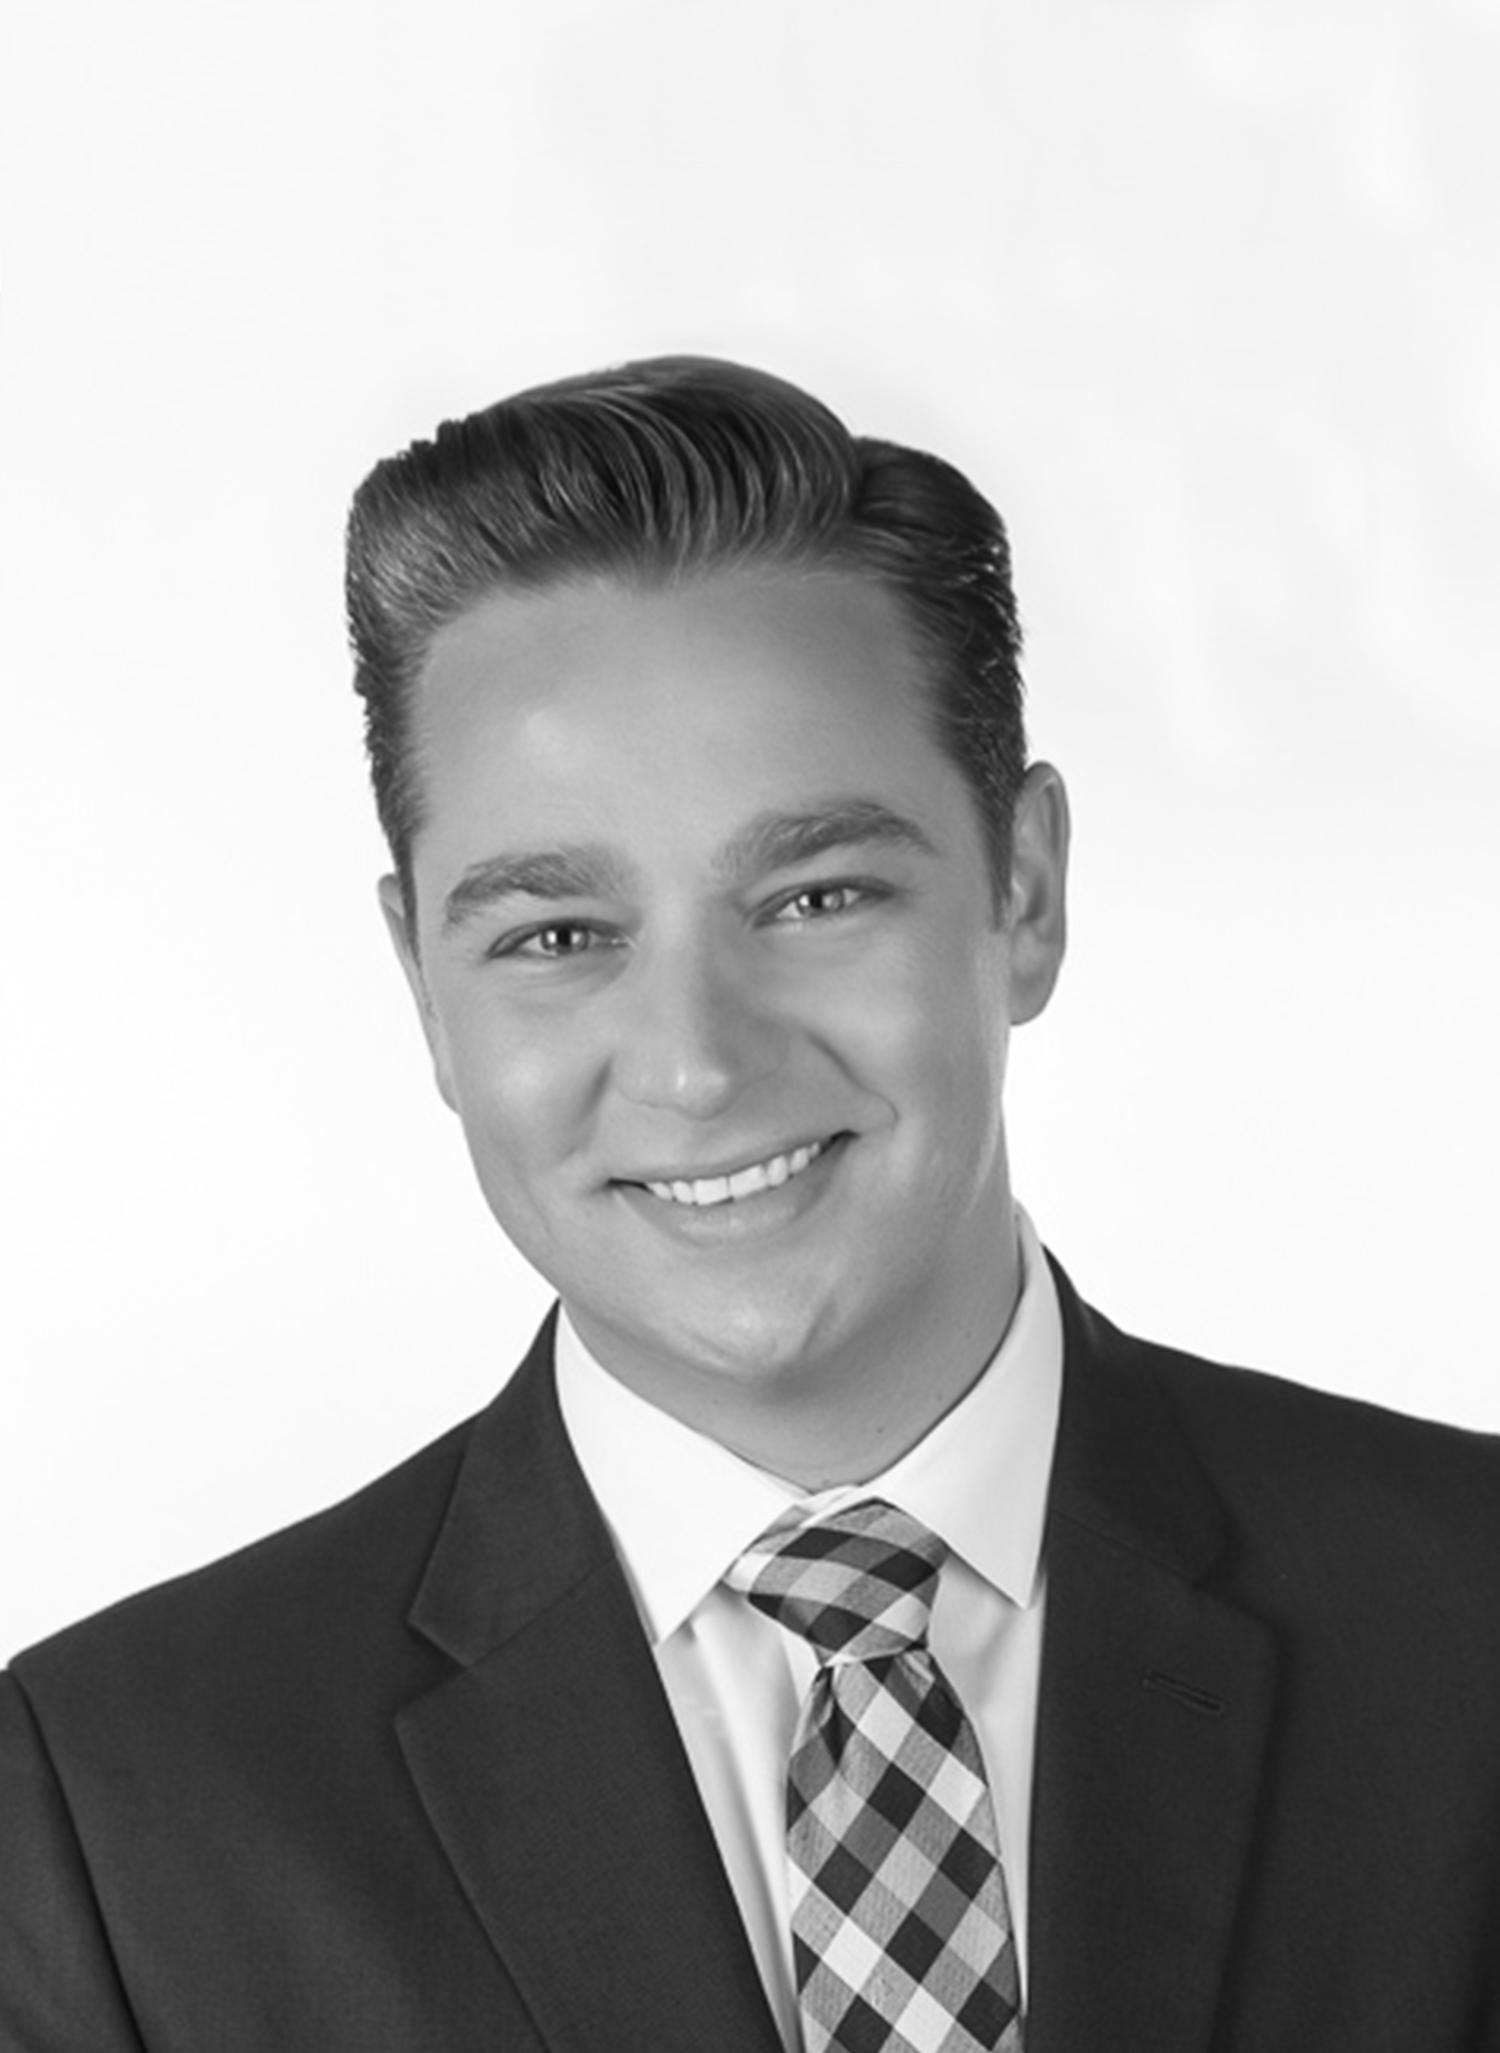 Jason Villanueva